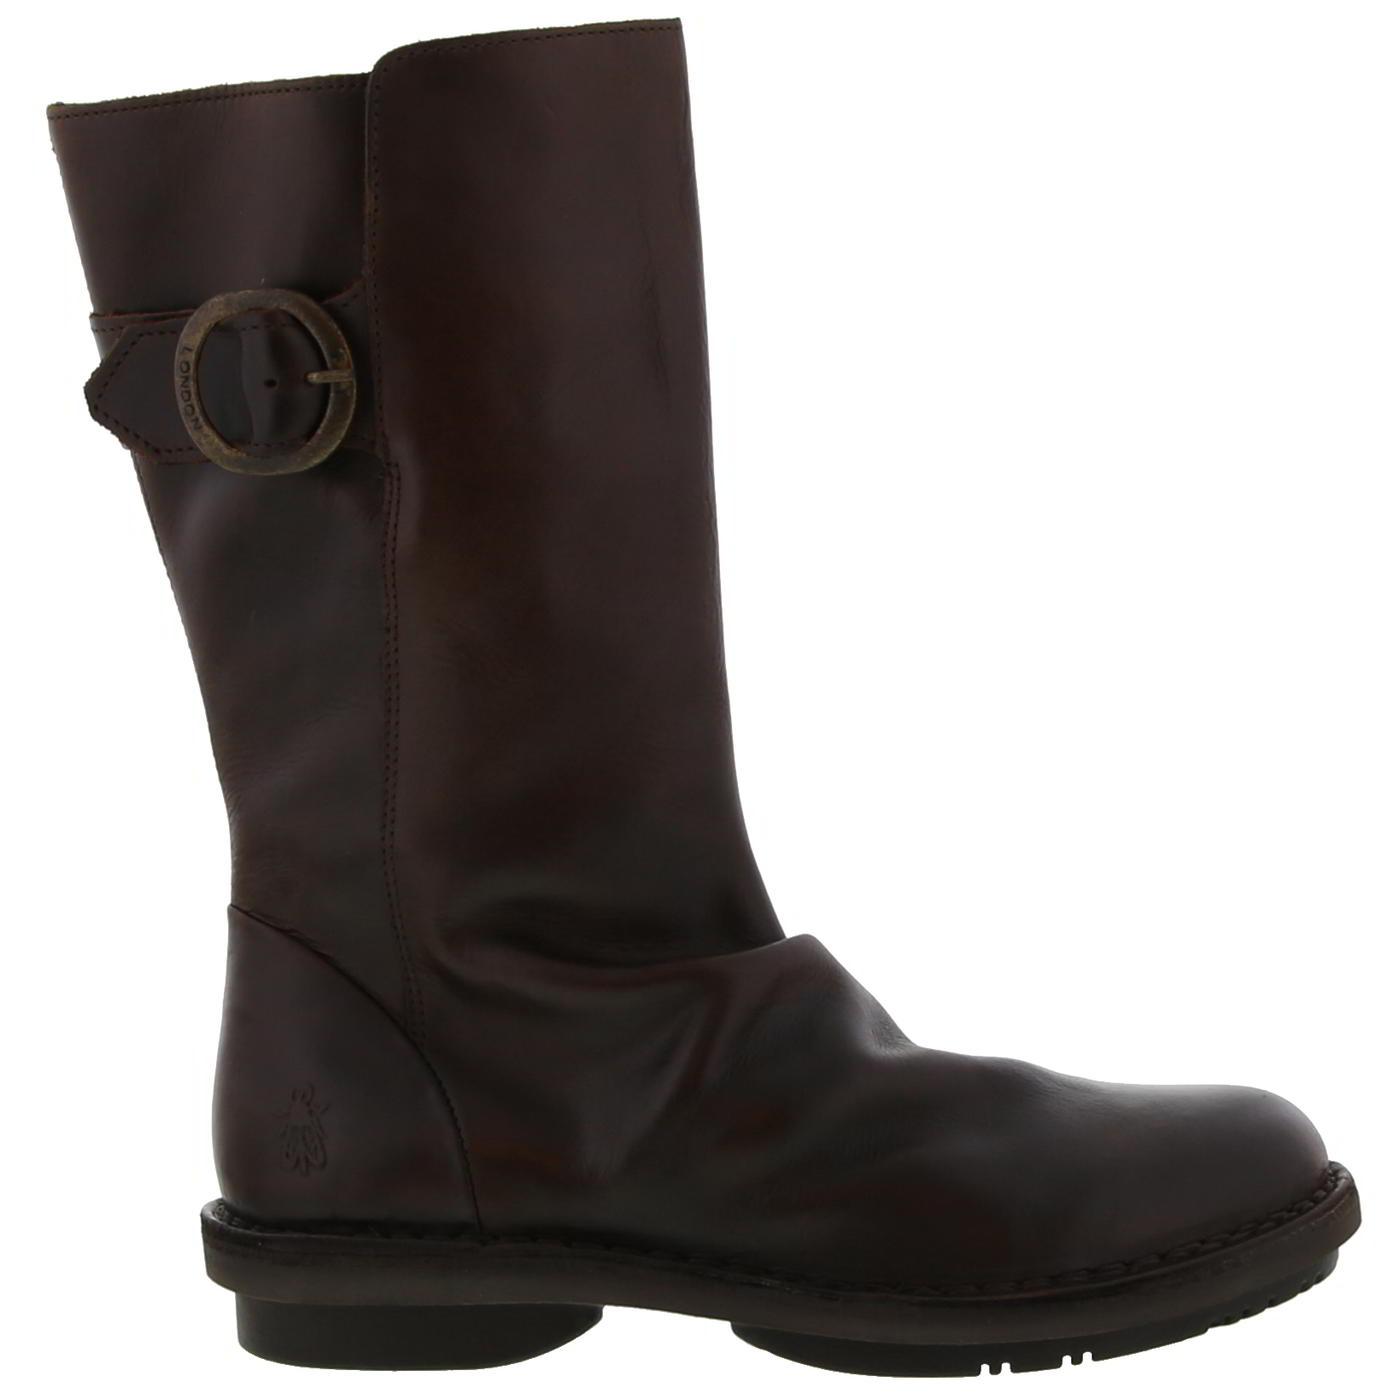 Fly london Reko542fly Black Womens Leather Calf Hi Boots